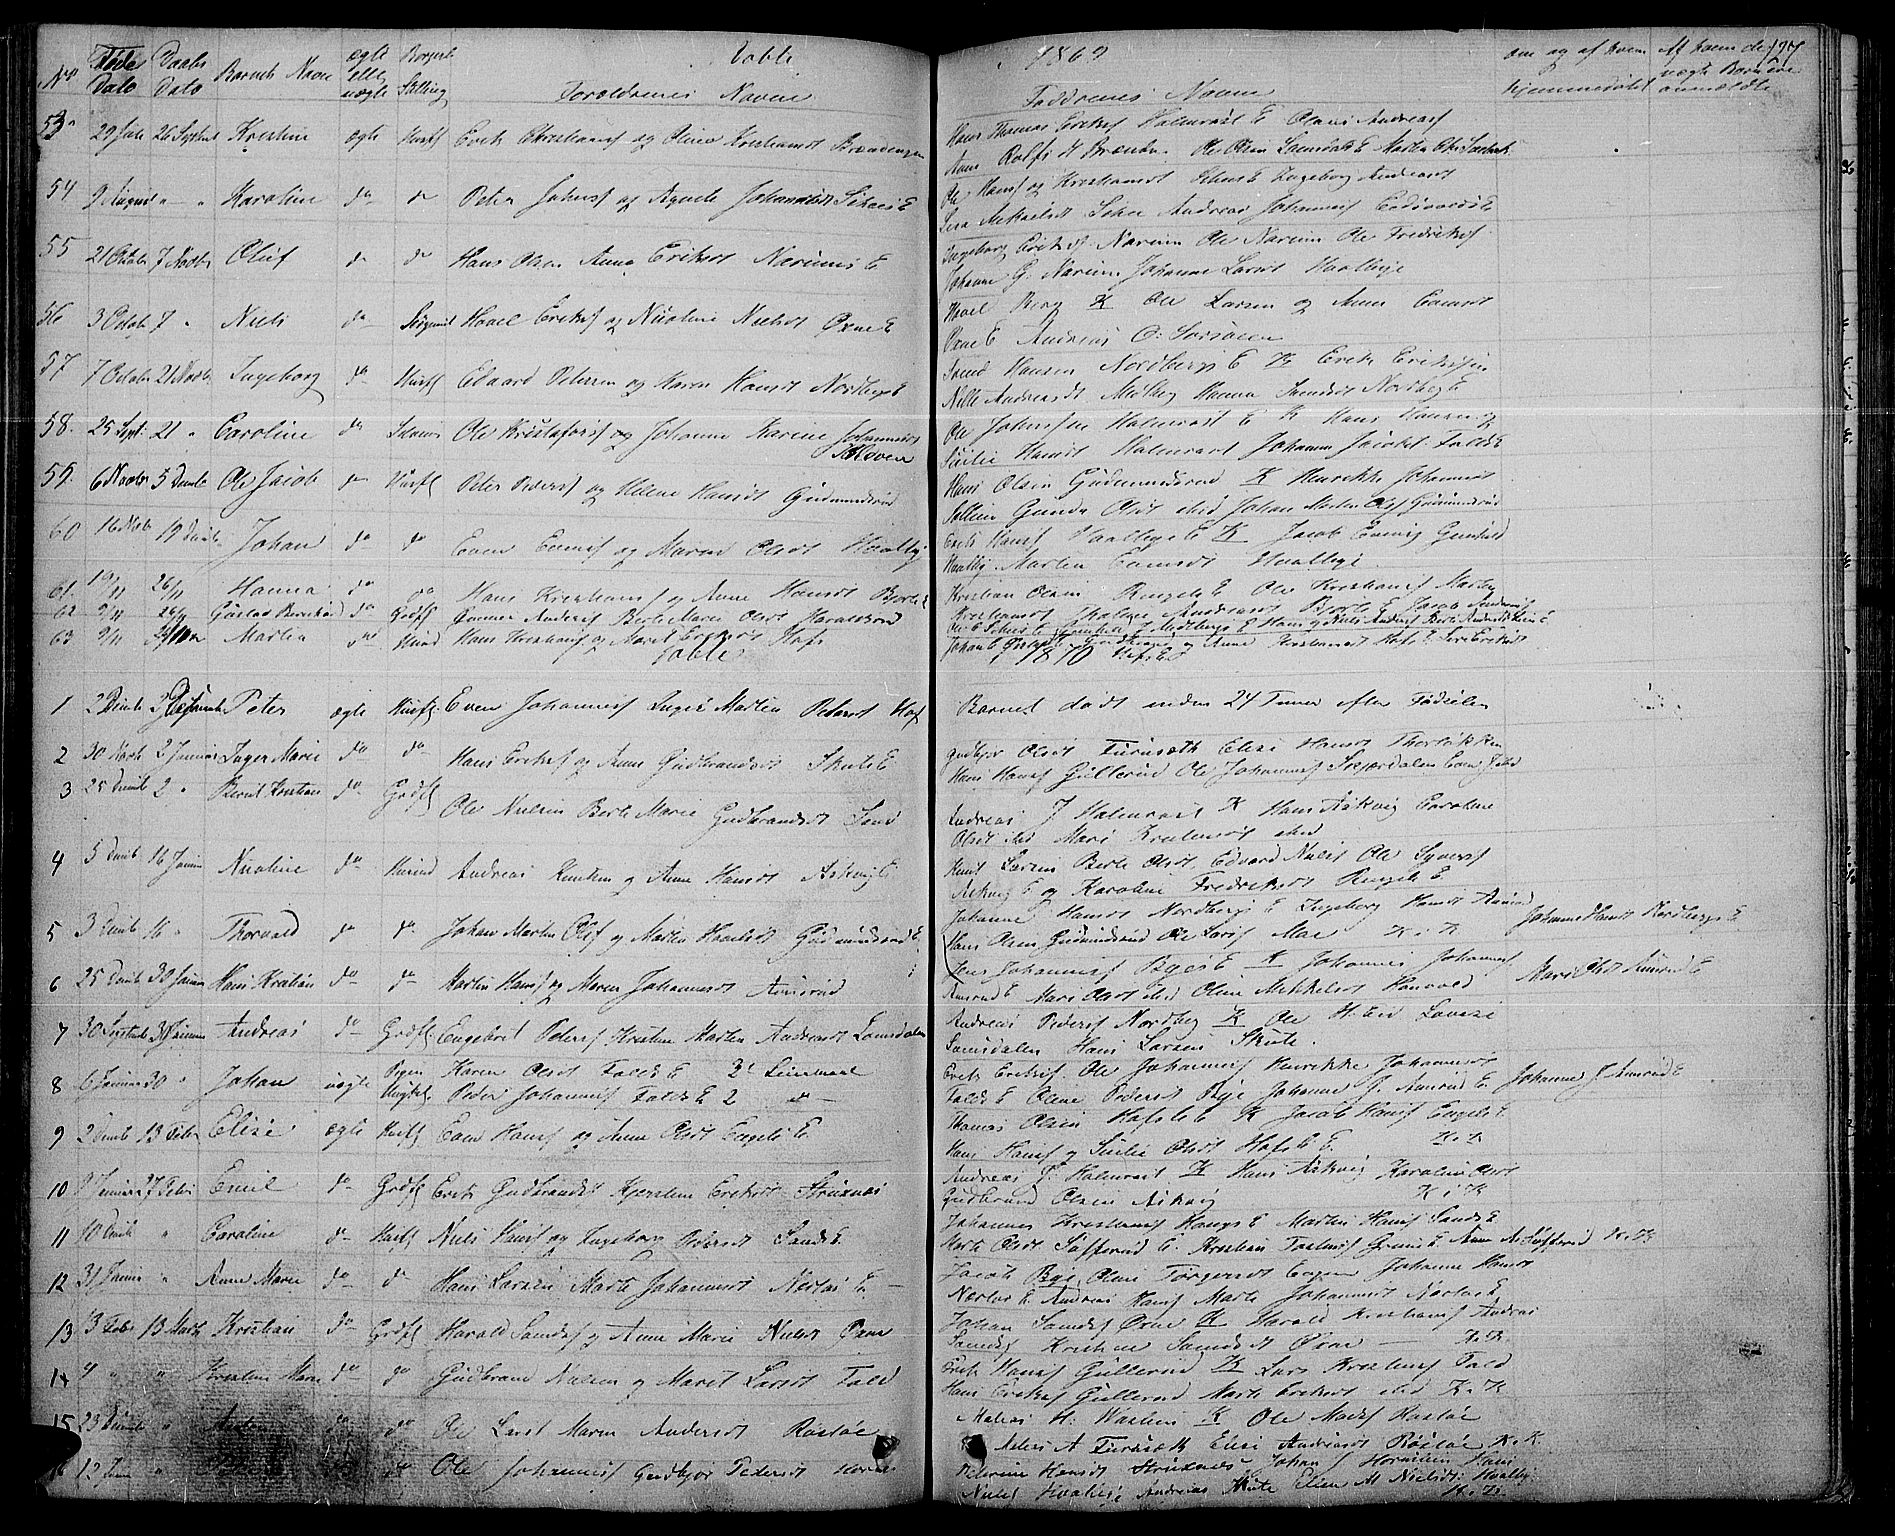 SAH, Søndre Land prestekontor, L/L0001: Klokkerbok nr. 1, 1849-1883, s. 127